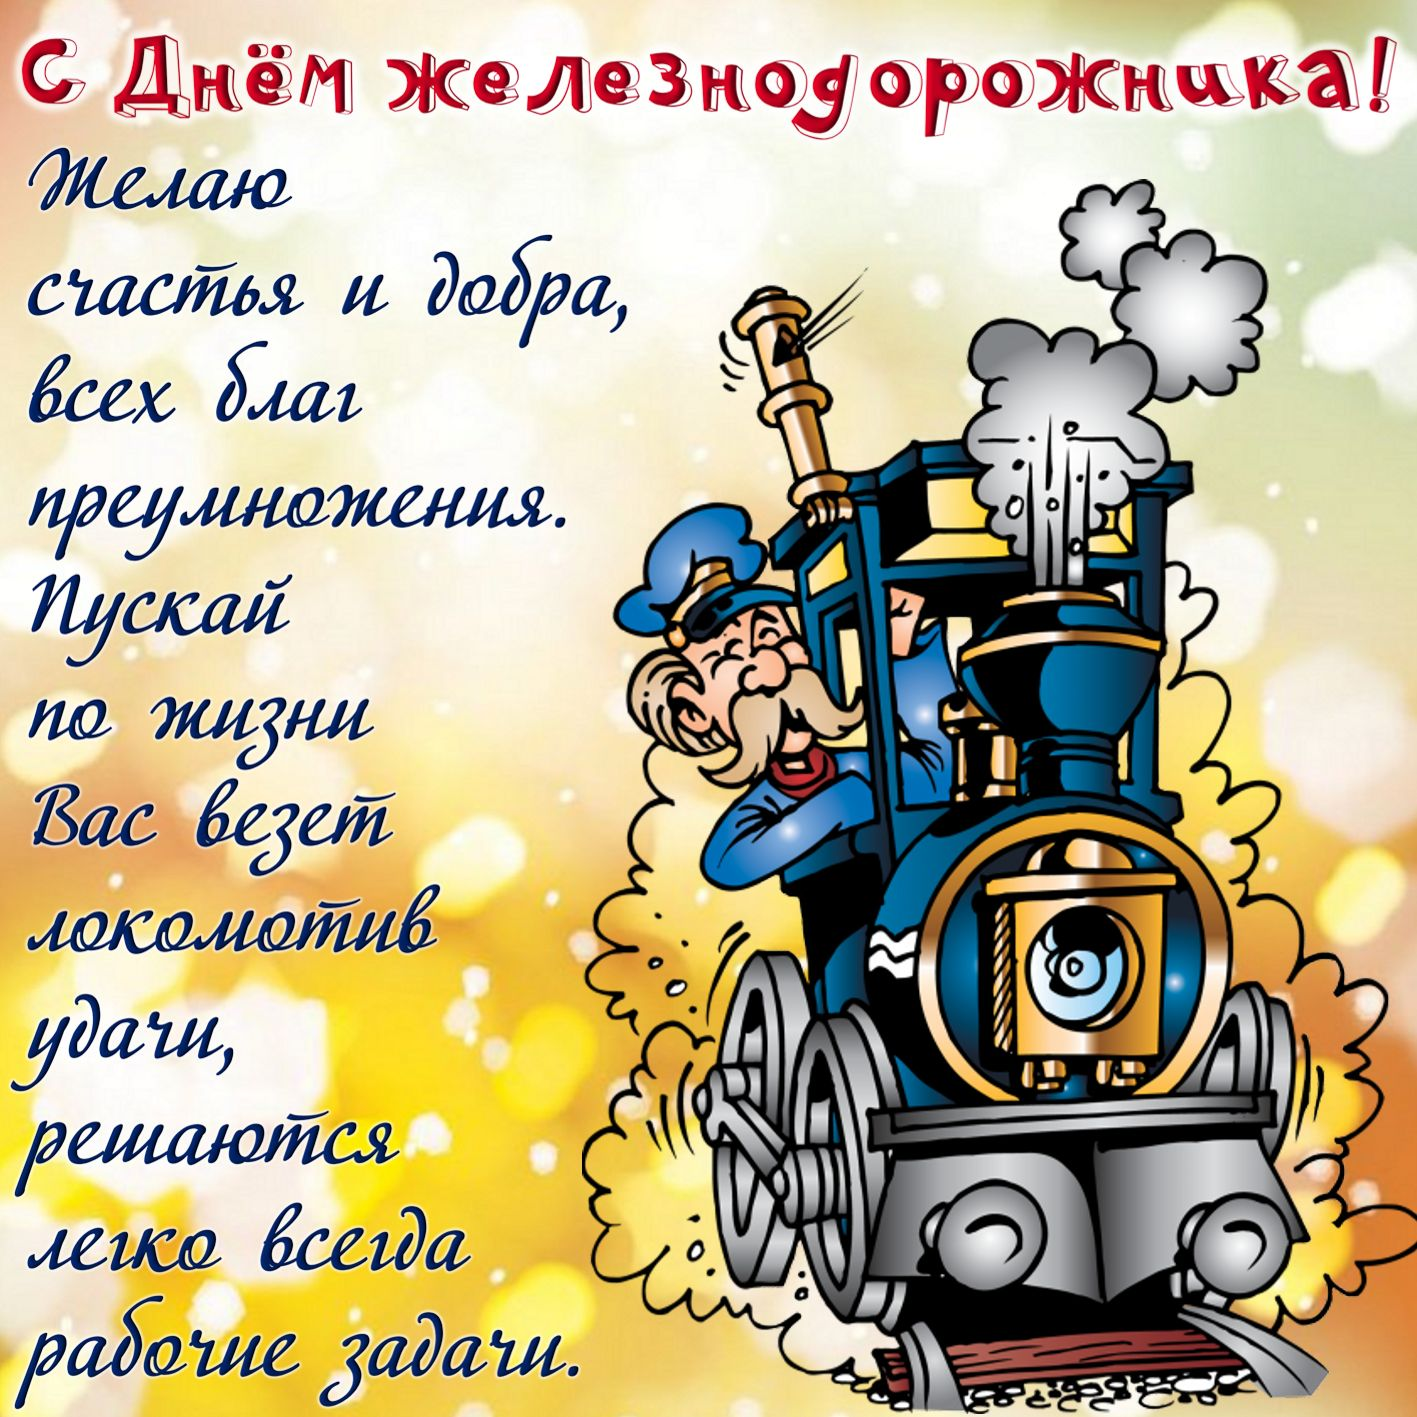 Открытка днем железнодорожника, месяца дочке картинки